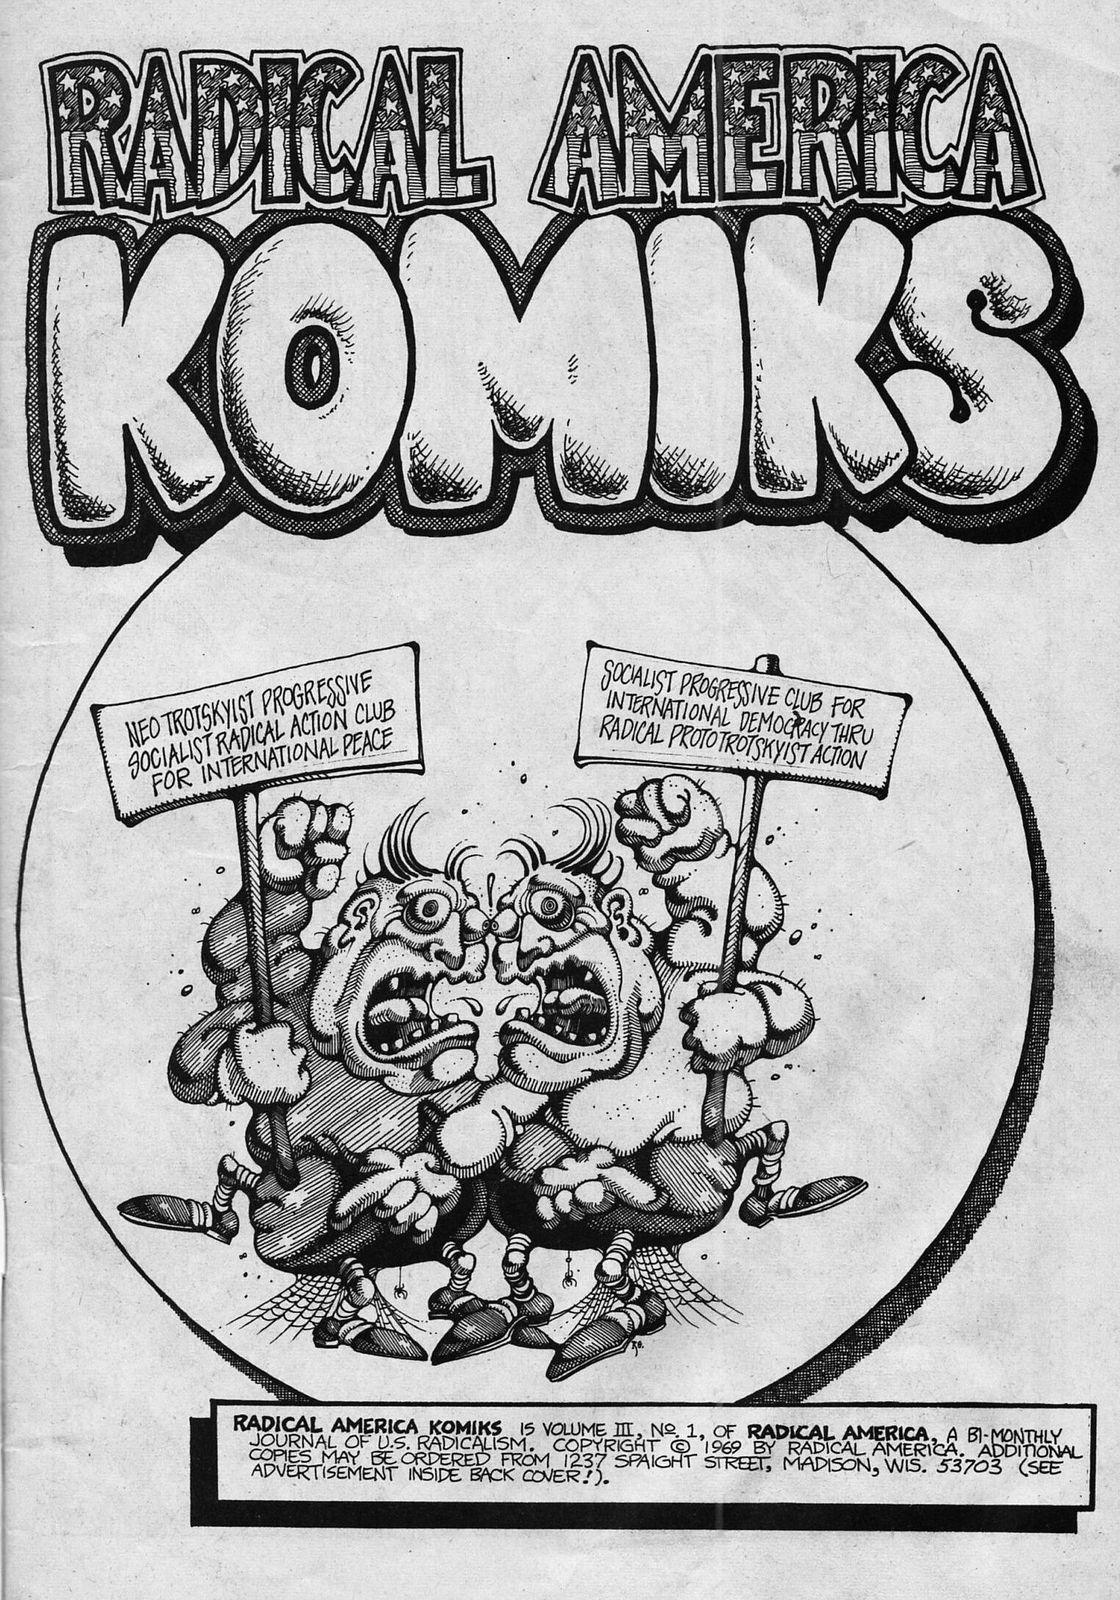 Radical America Komics 1969 classic Underground comix, 1st printing, SDS